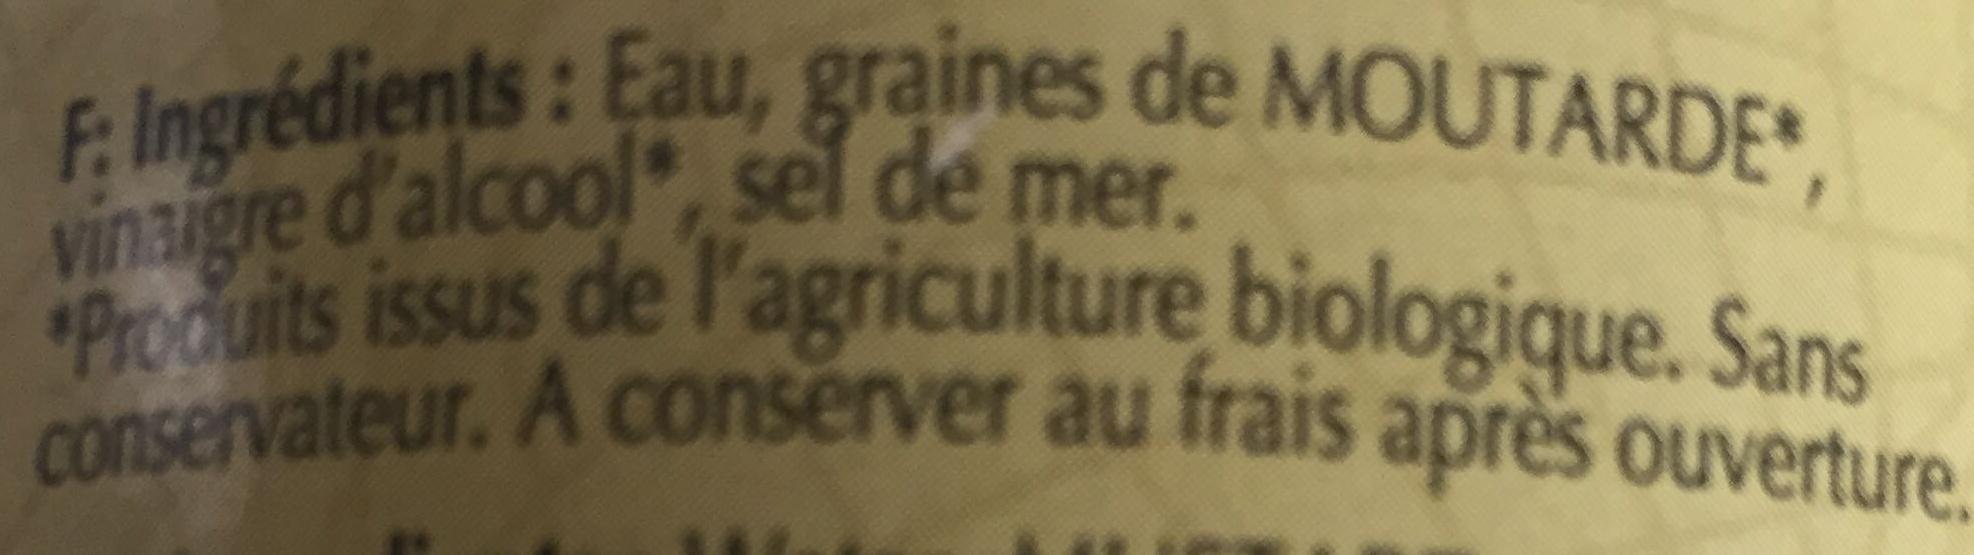 Moutarde forte de Dijon - Ingrédients - fr